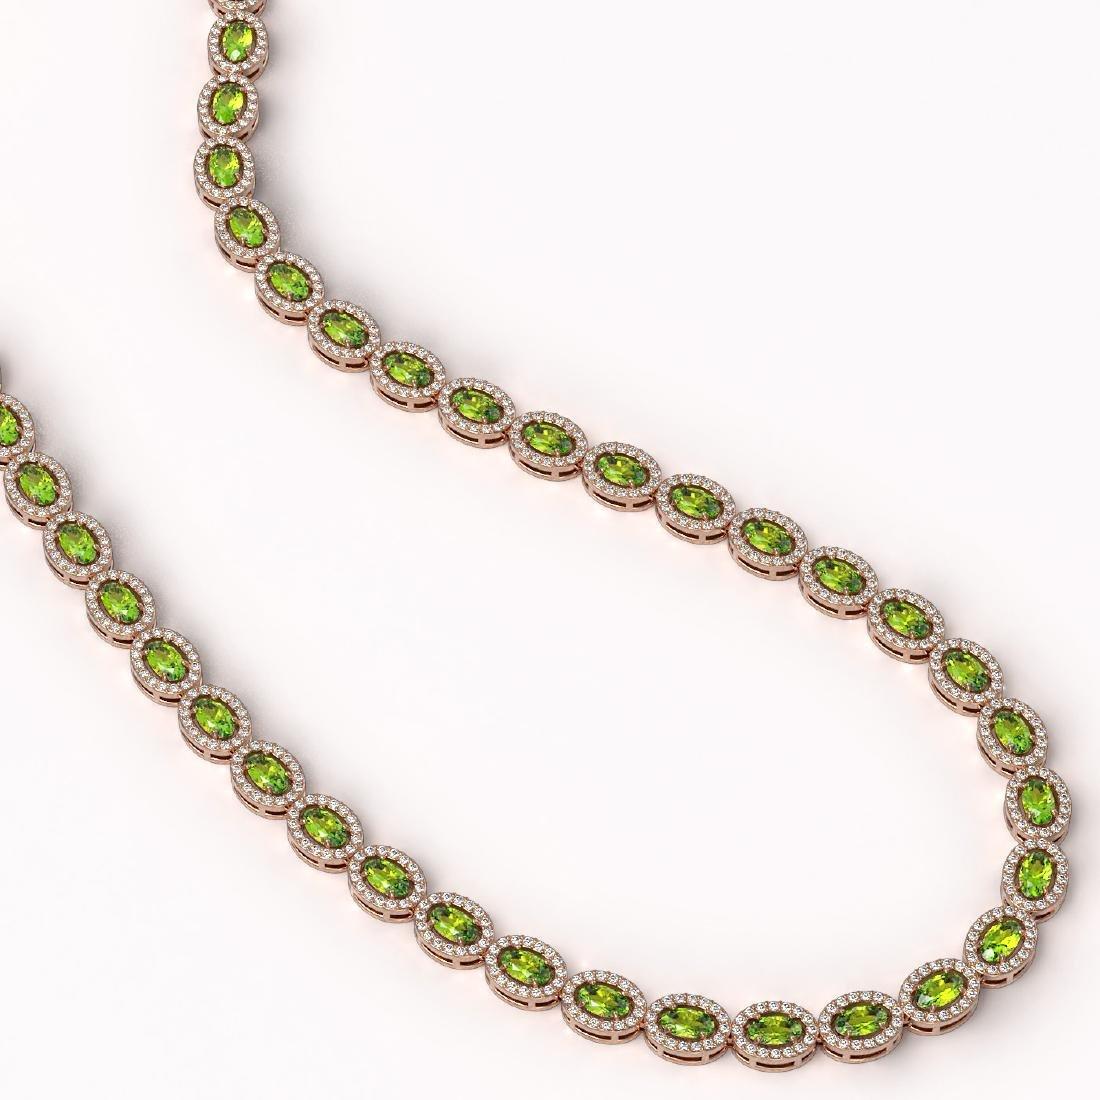 23.86 CTW Peridot & Diamond Halo Necklace 10K Rose Gold - 2